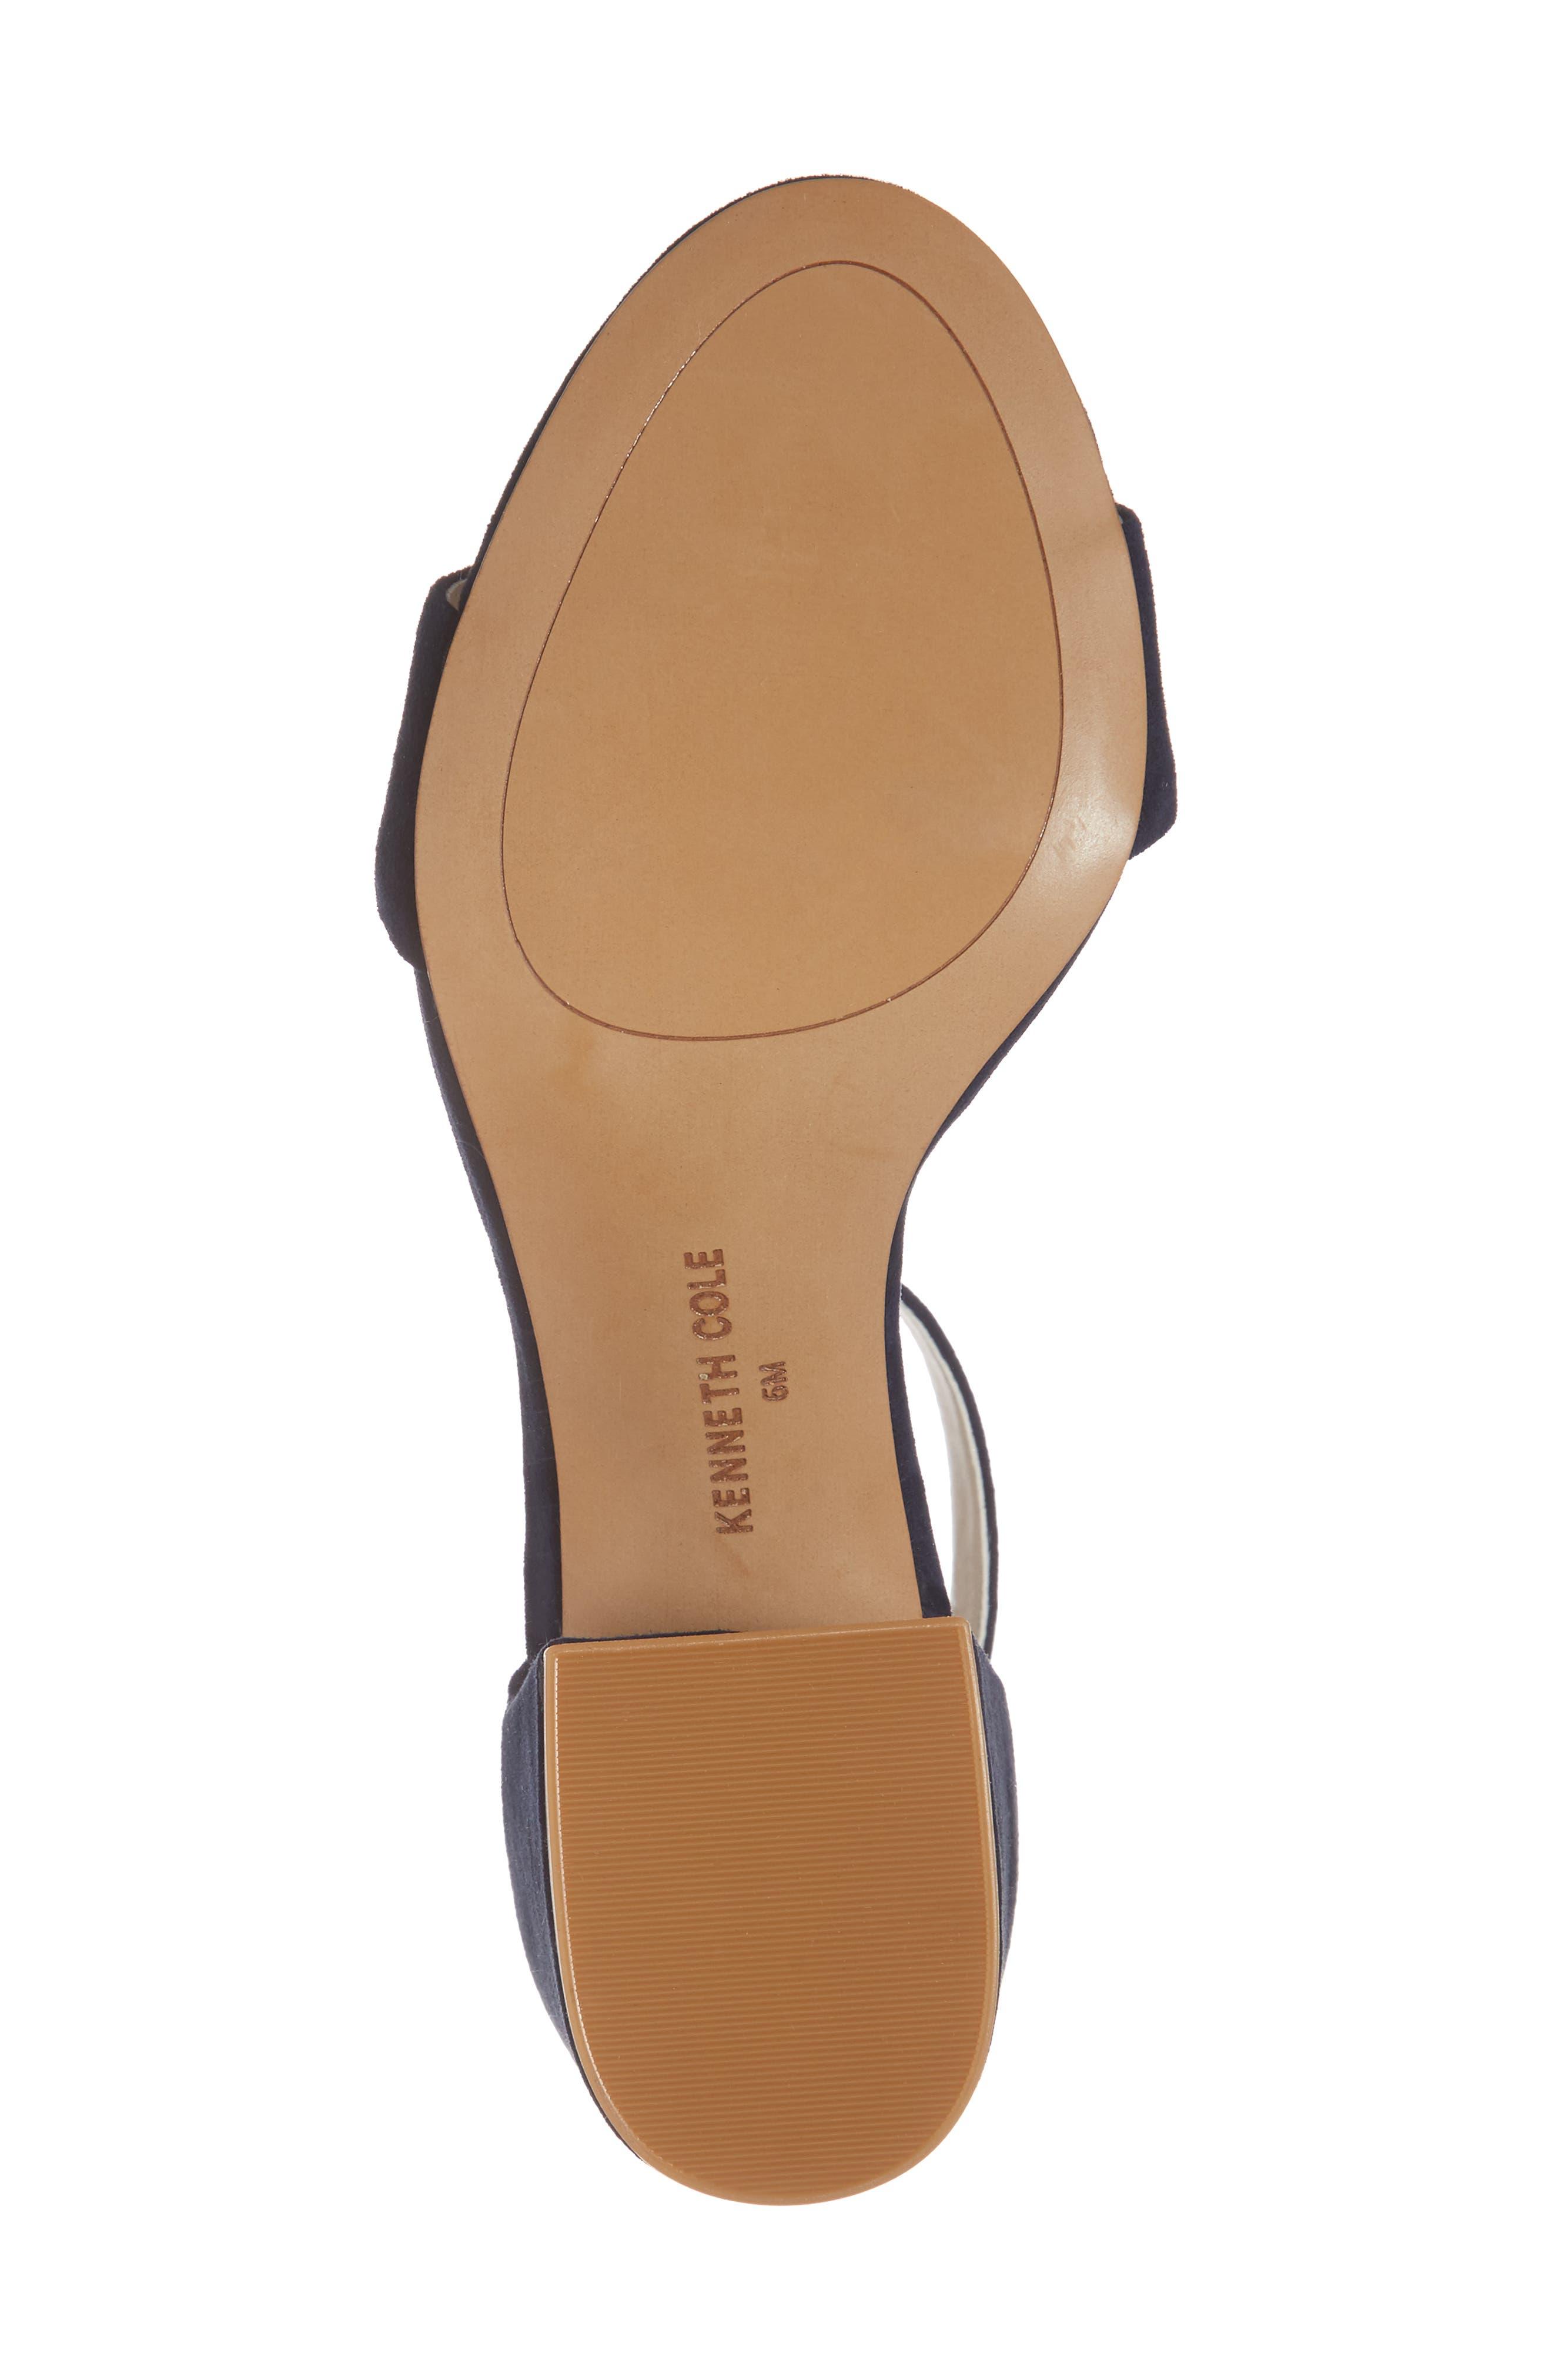 Hannon Block Heel Ankle Strap Sandal,                             Alternate thumbnail 6, color,                             Navy Suede